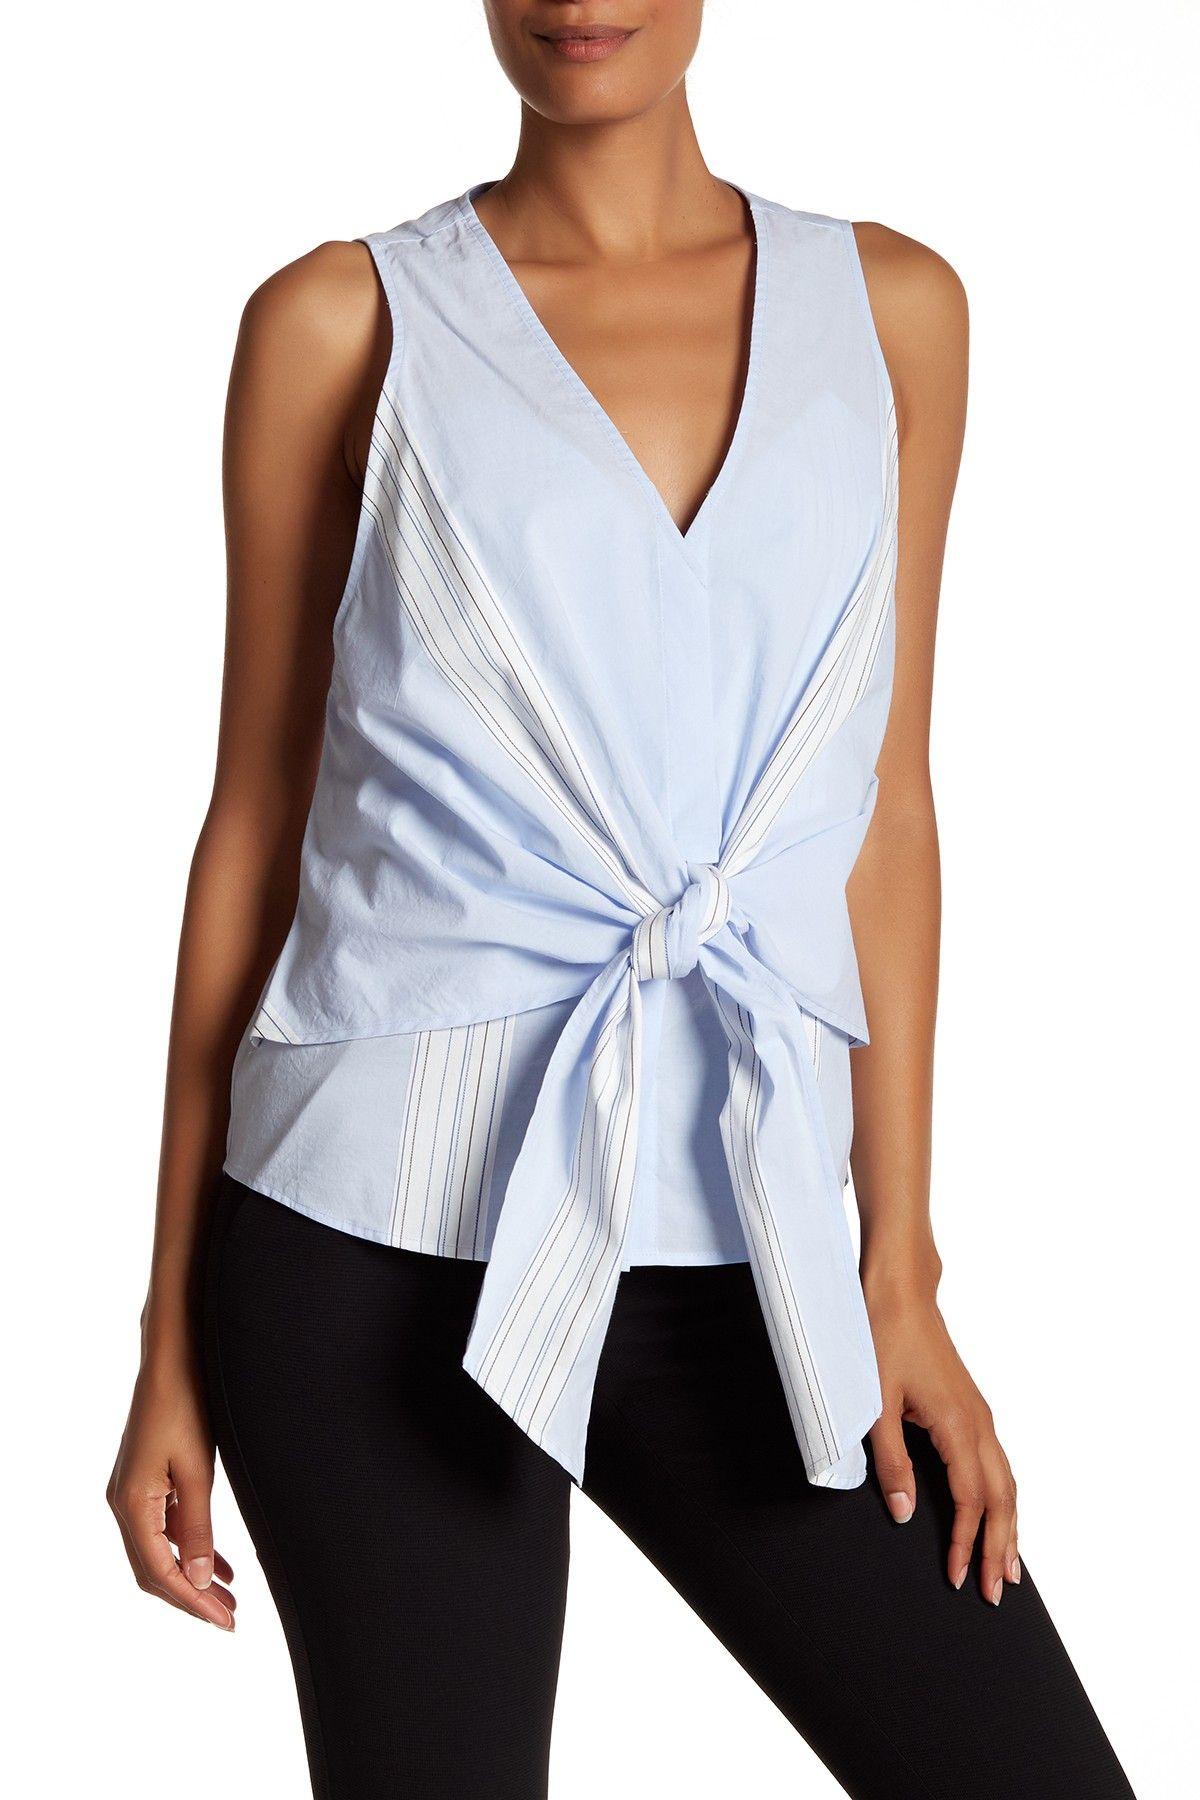 Derek lam crosby sleeveless tie front blouse fashion women